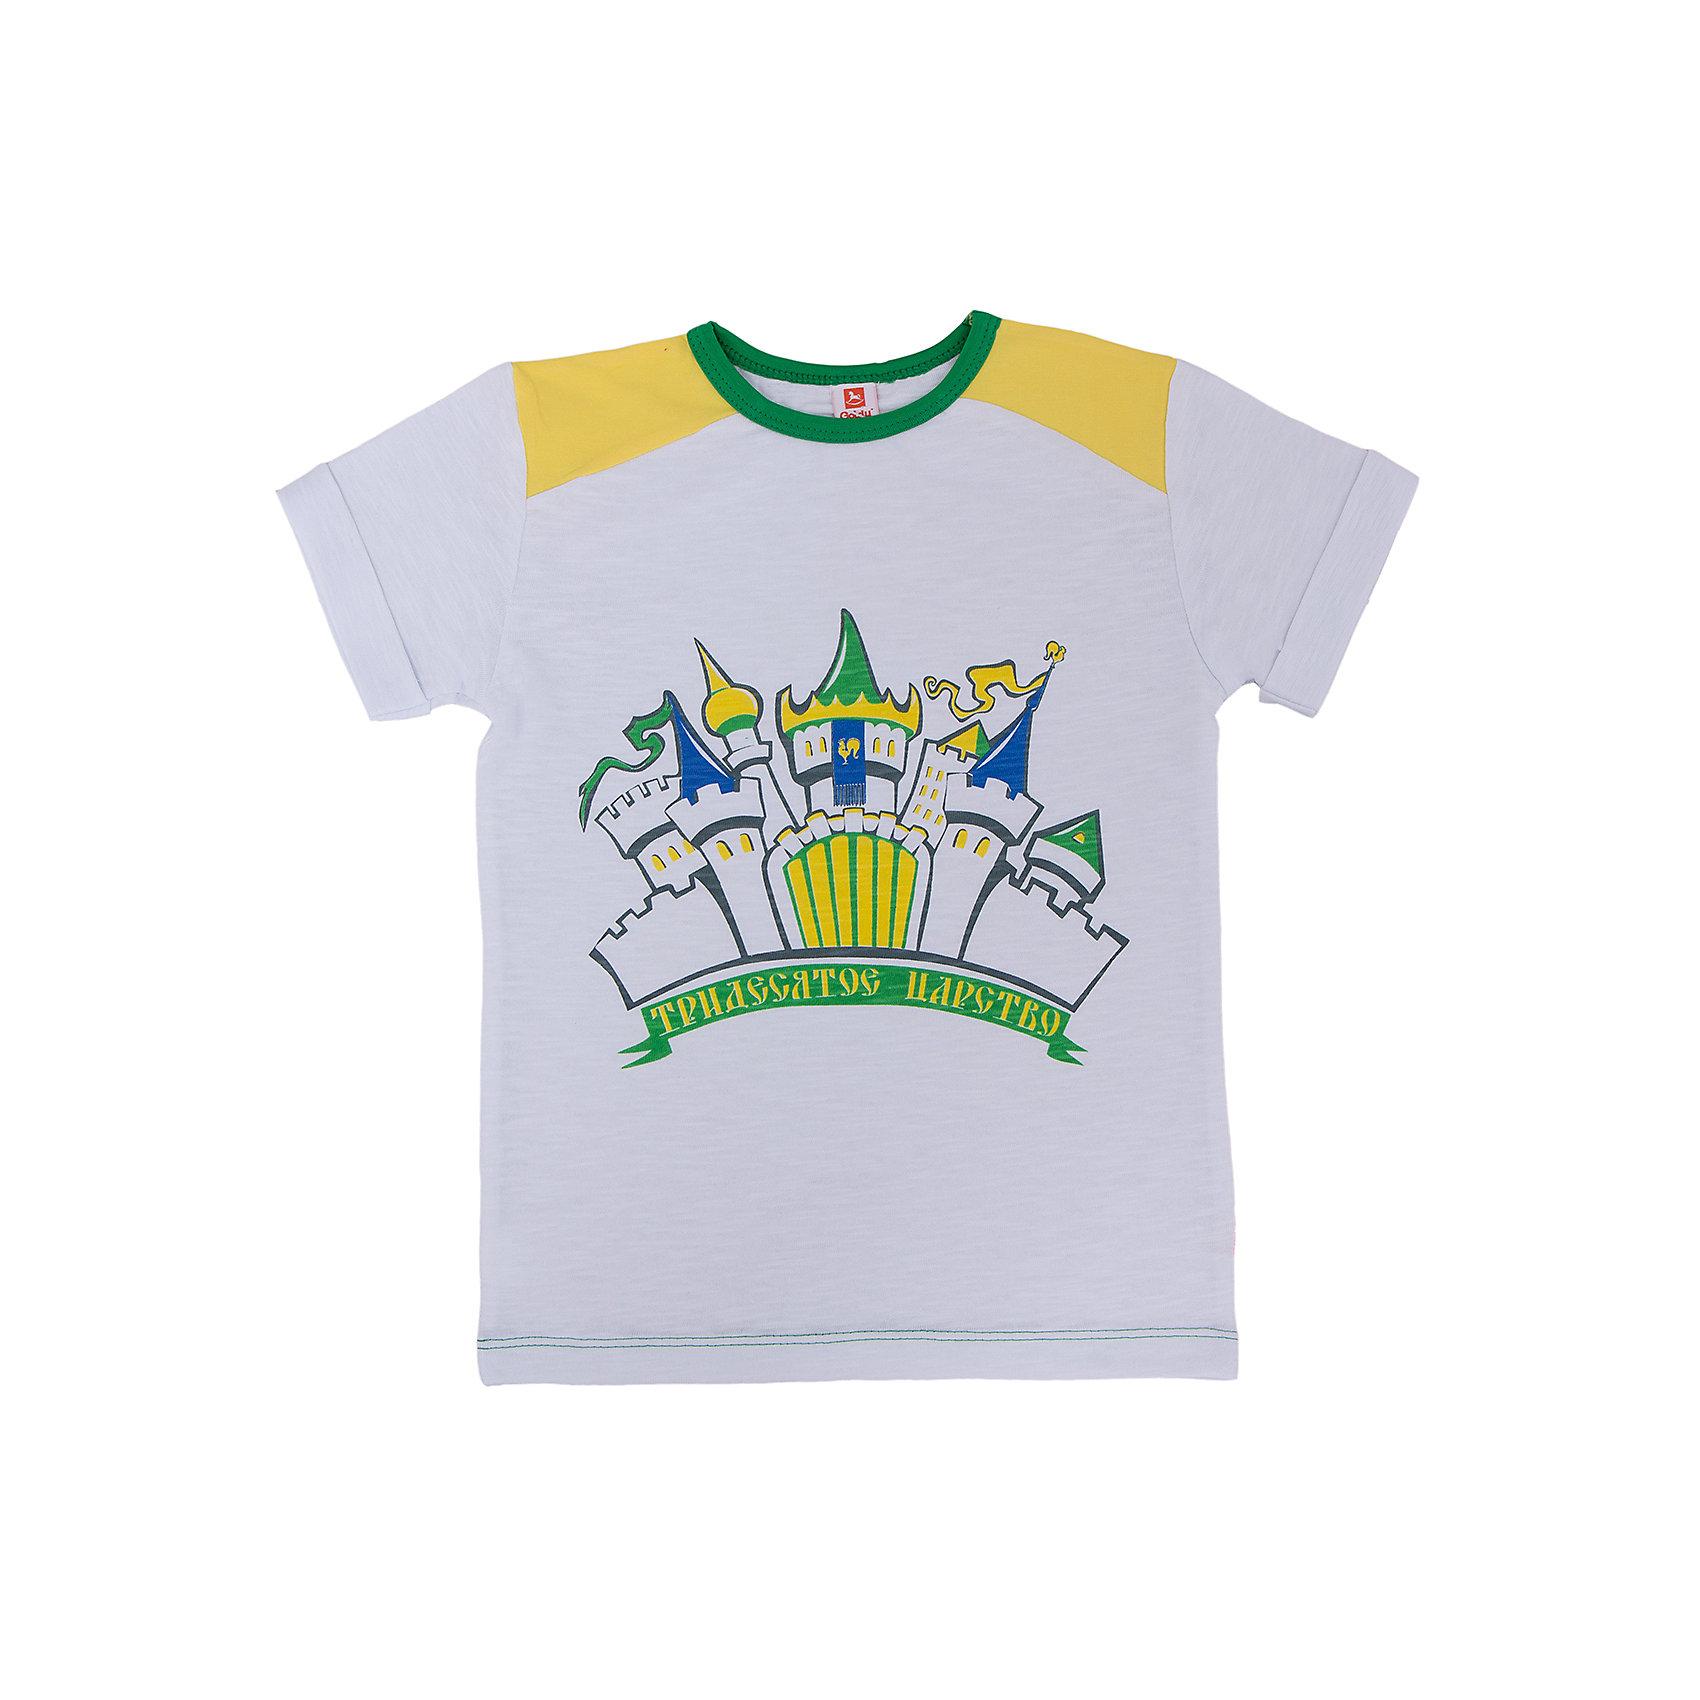 Goldy Футболка  для мальчика Goldy футболки и топы goldy футболка для мальчика 673 093 601